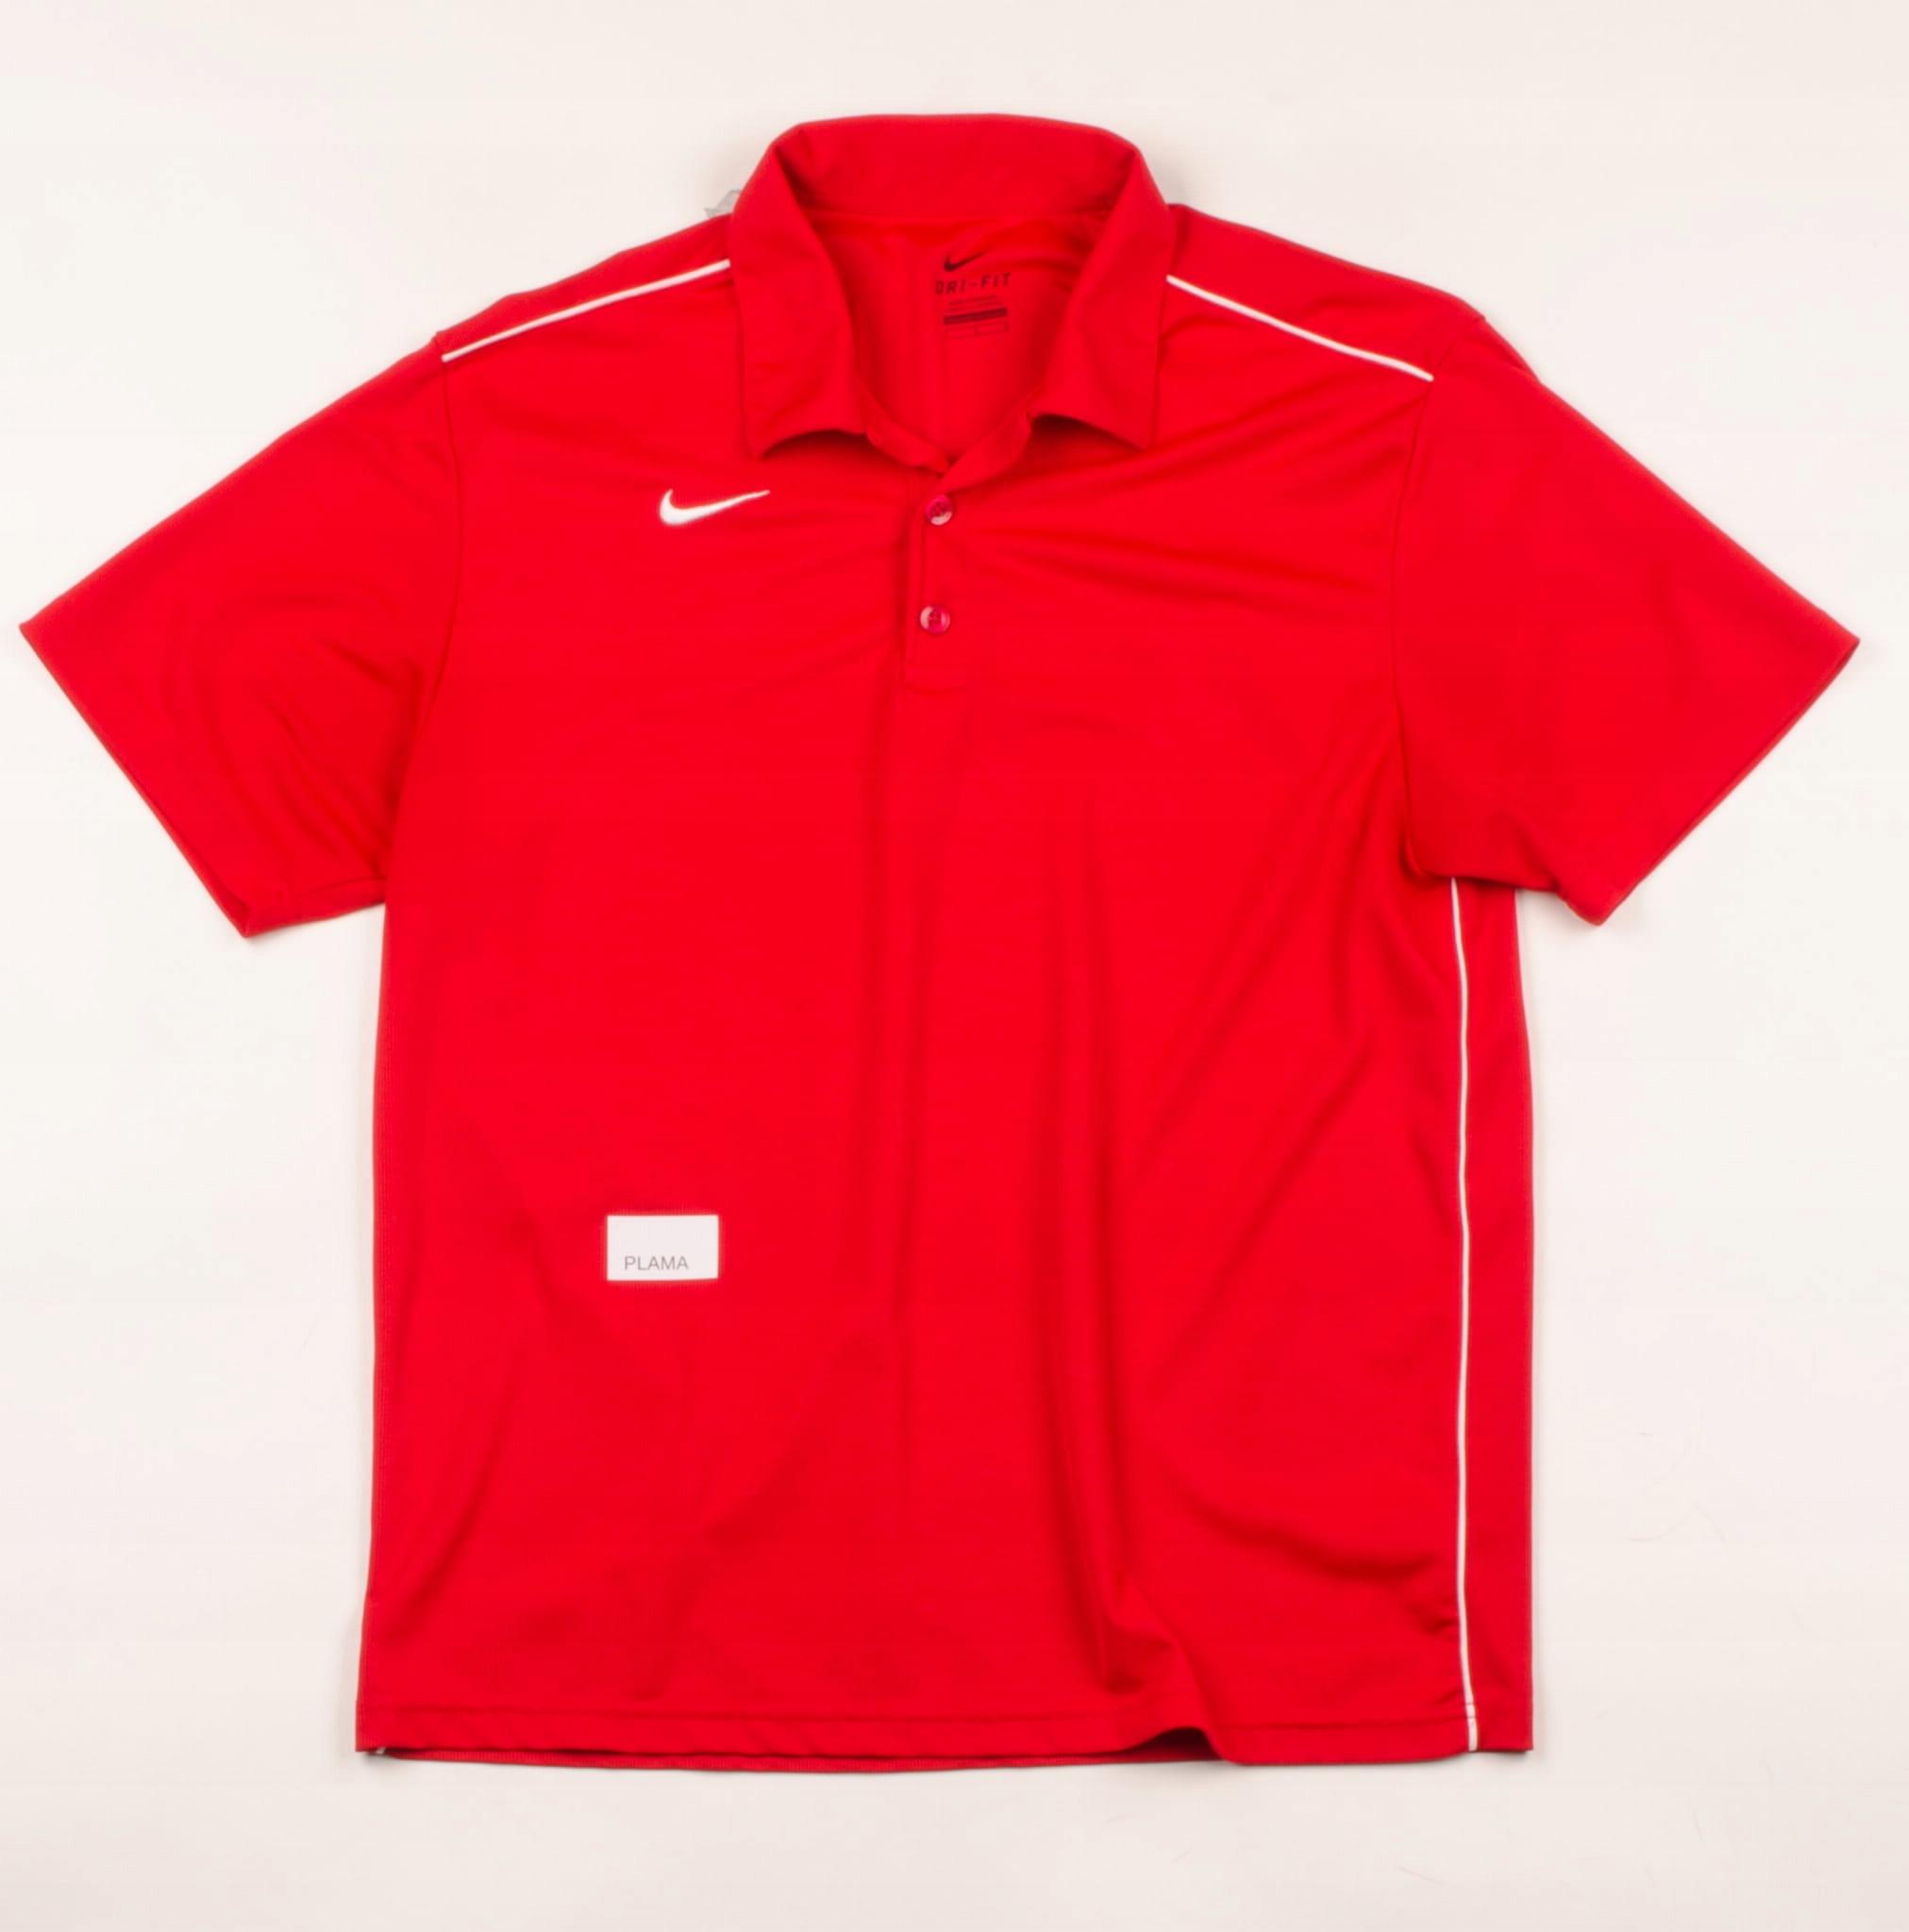 32776 MICRO WADA Nike Koszulka Sportowa Męska L